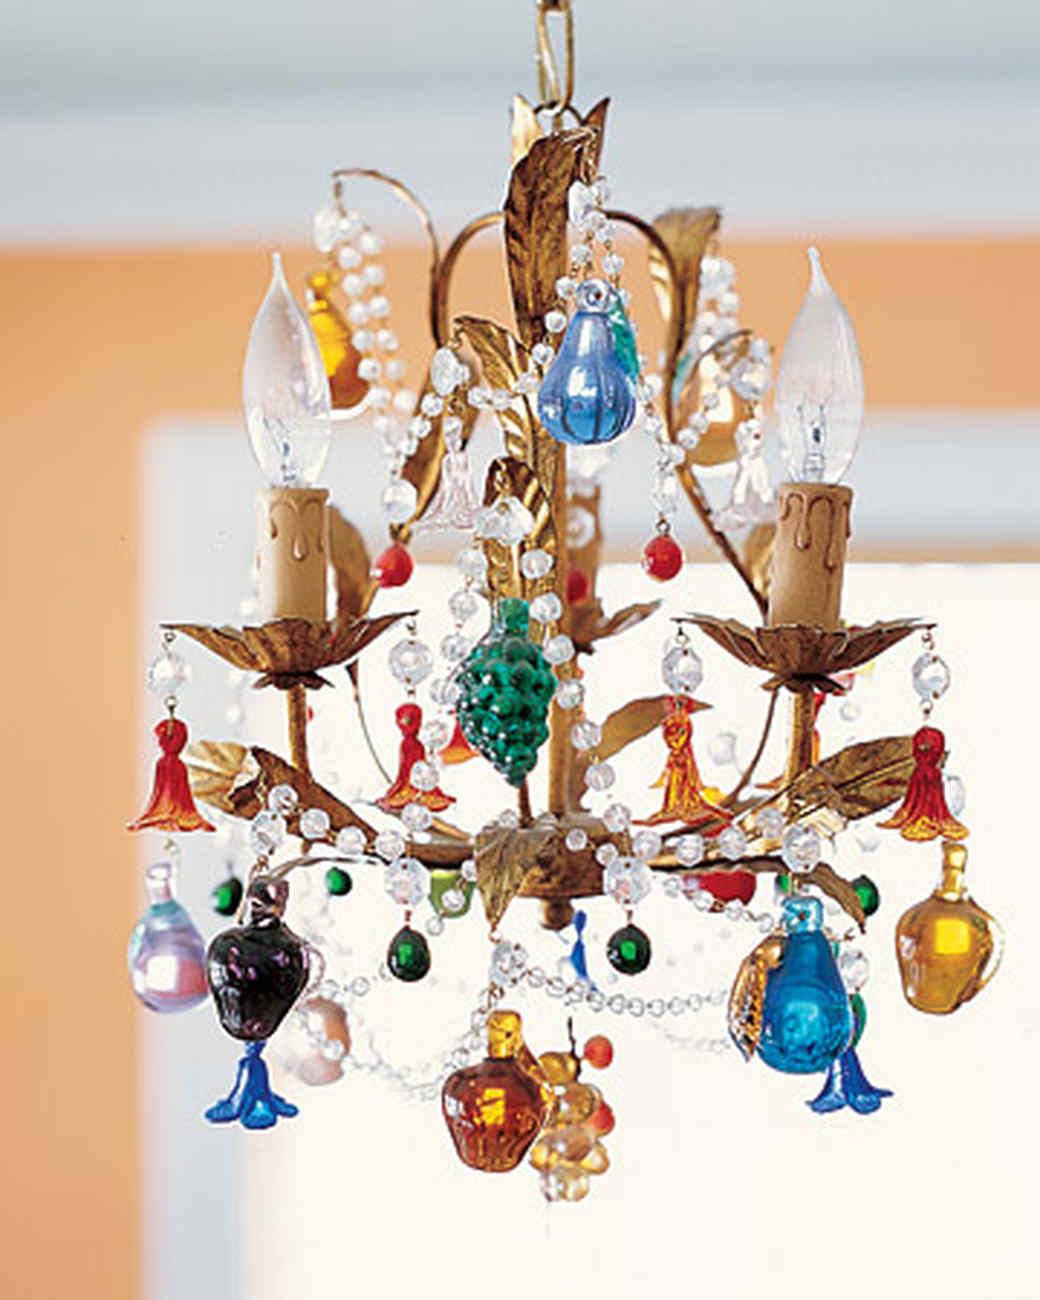 ml0903_0903_chandelier.jpg